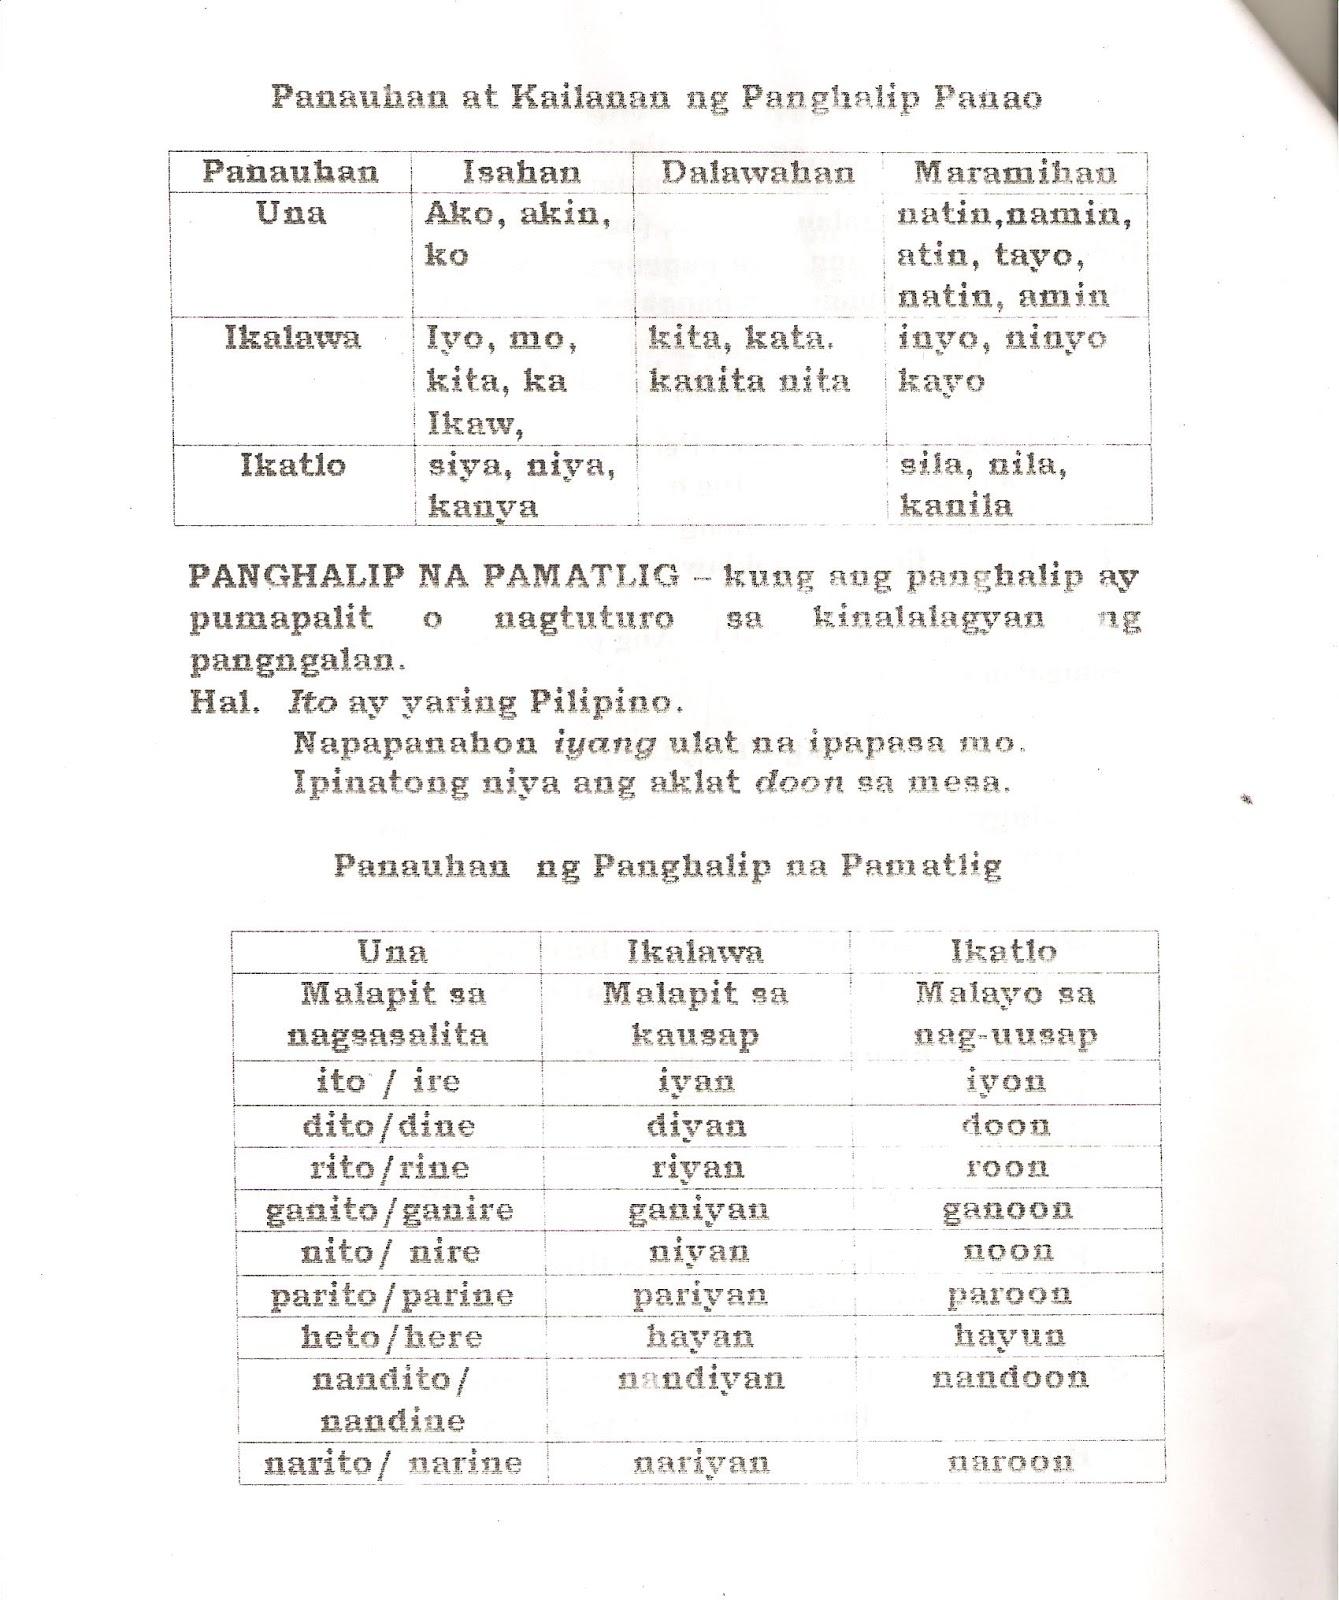 small resolution of Pang Abay O Pang Uri Worksheet   Printable Worksheets and Activities for  Teachers